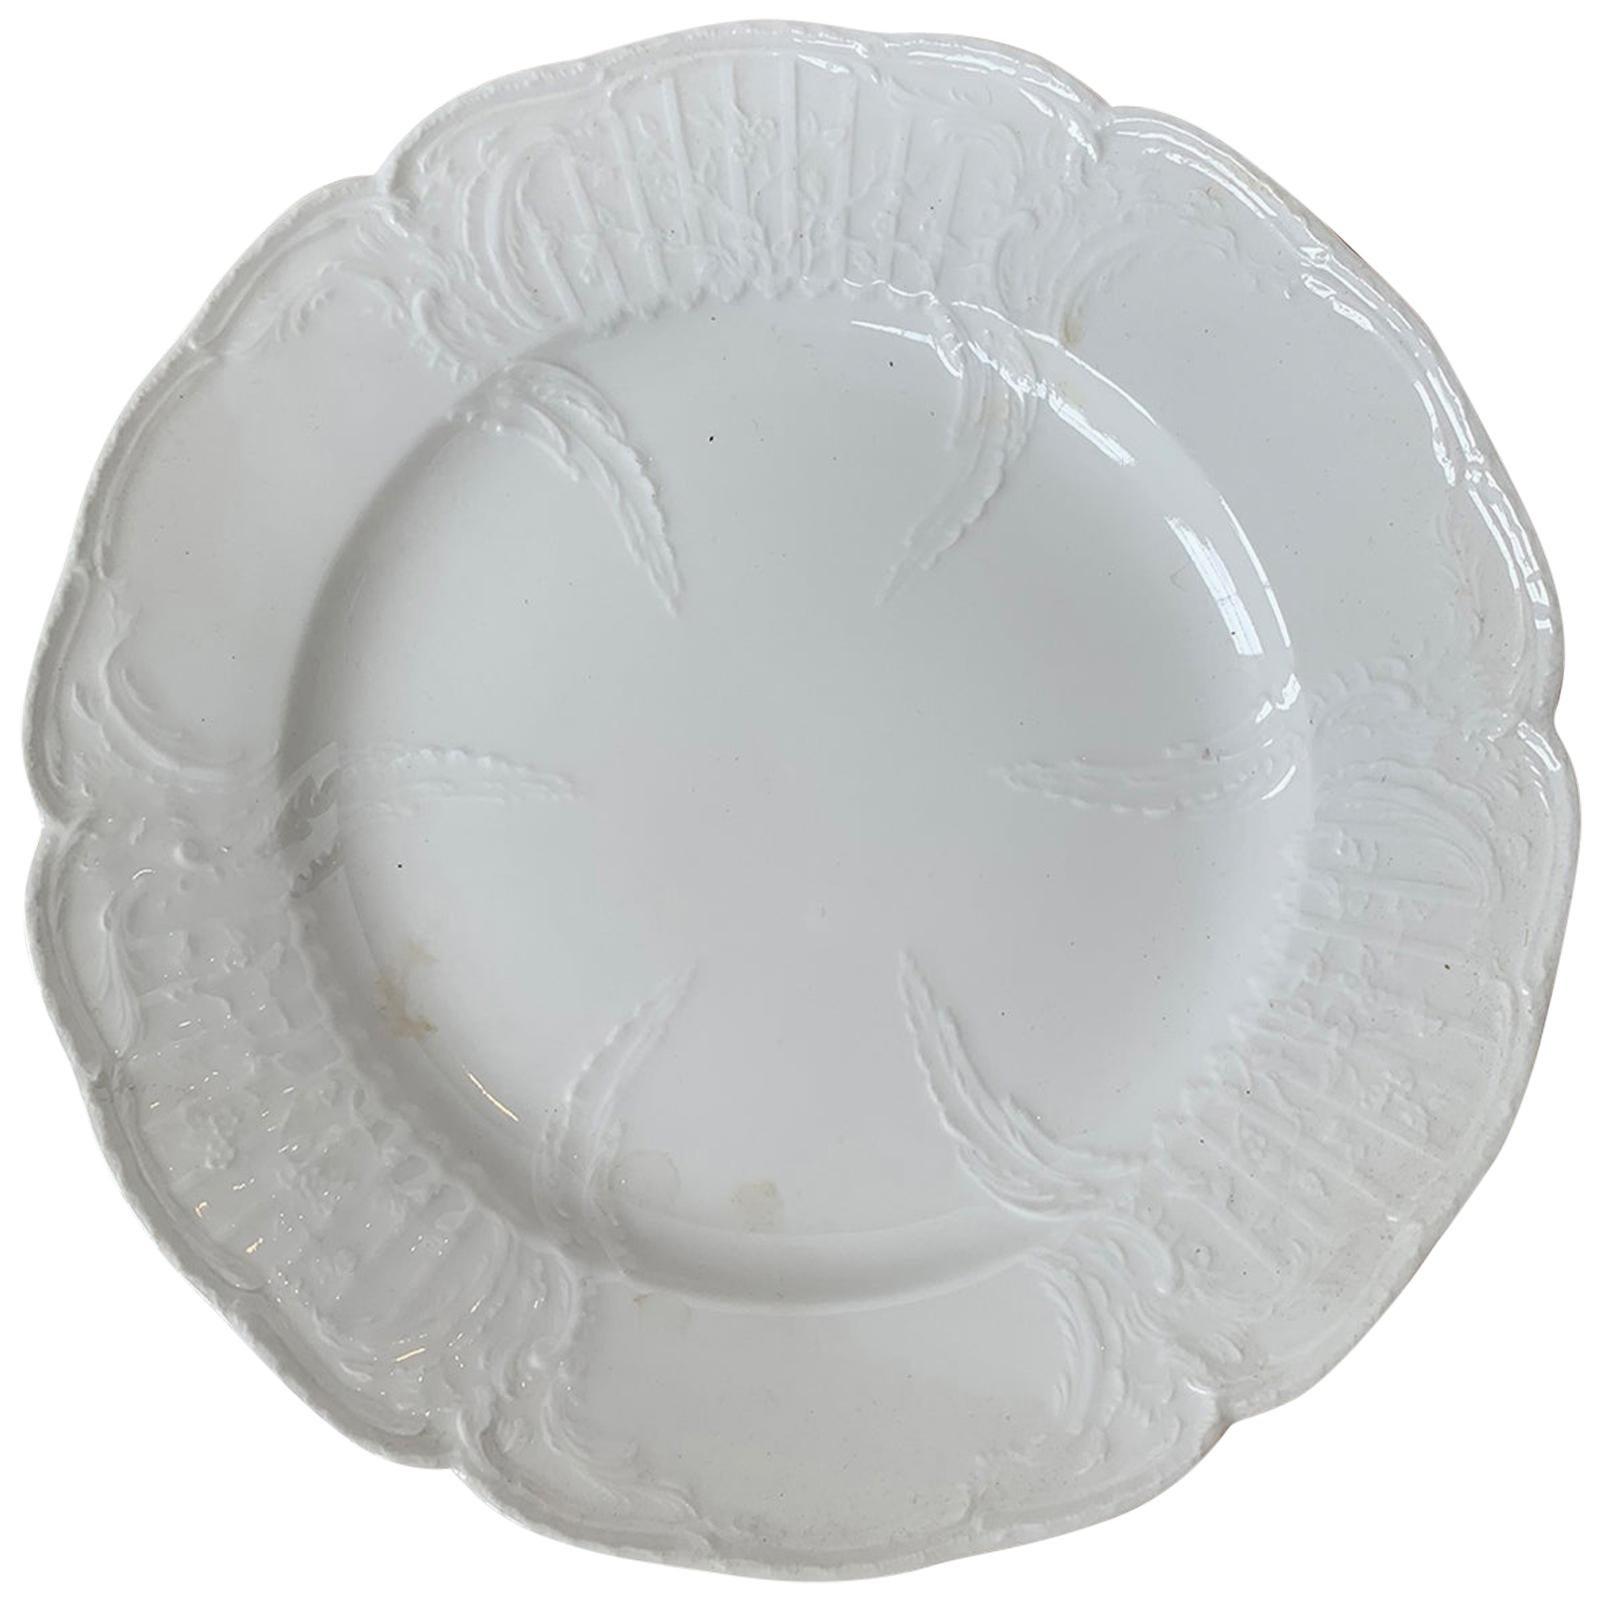 German Berlin Royal Vienna Style White Porcelain Plate by KPM Neuosier